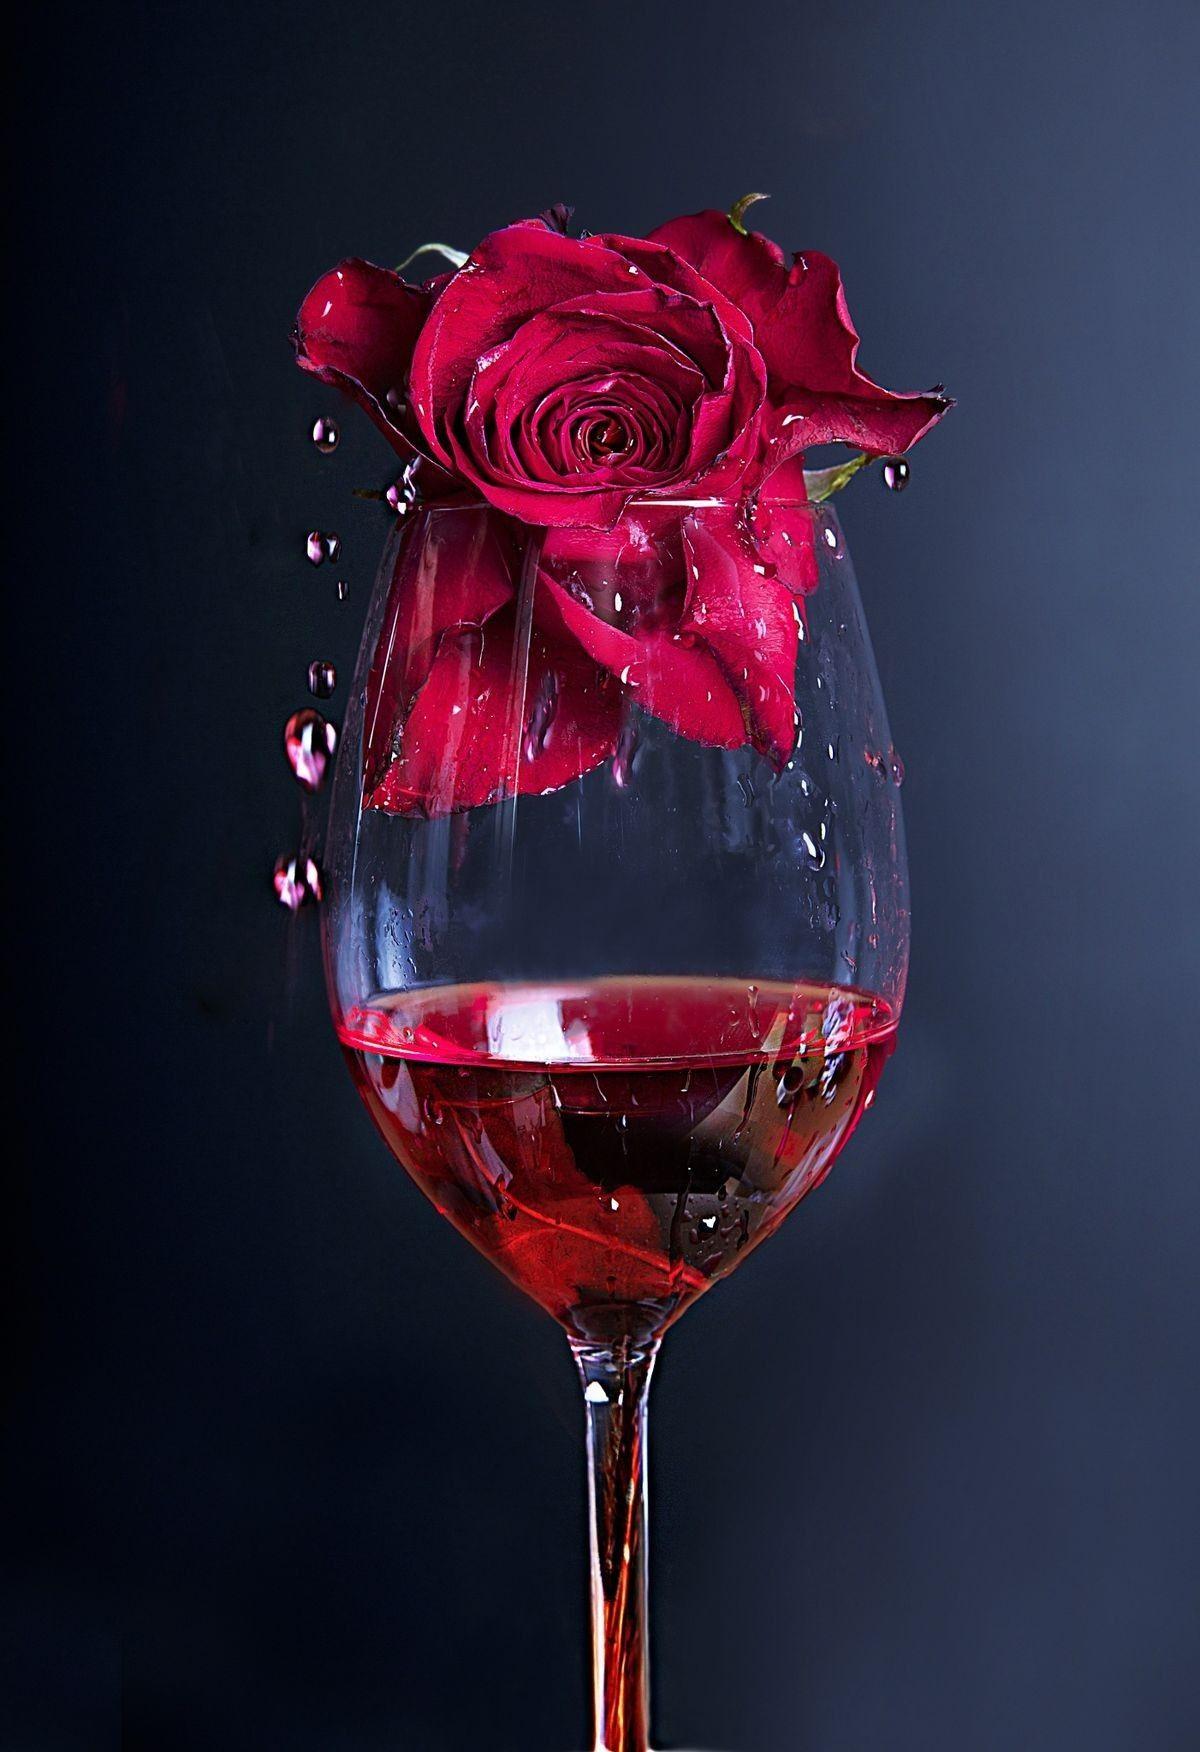 Nyr Organic Uk Neals Yard Remedies Wine Wallpaper Red Roses Wallpaper Rose Wallpaper